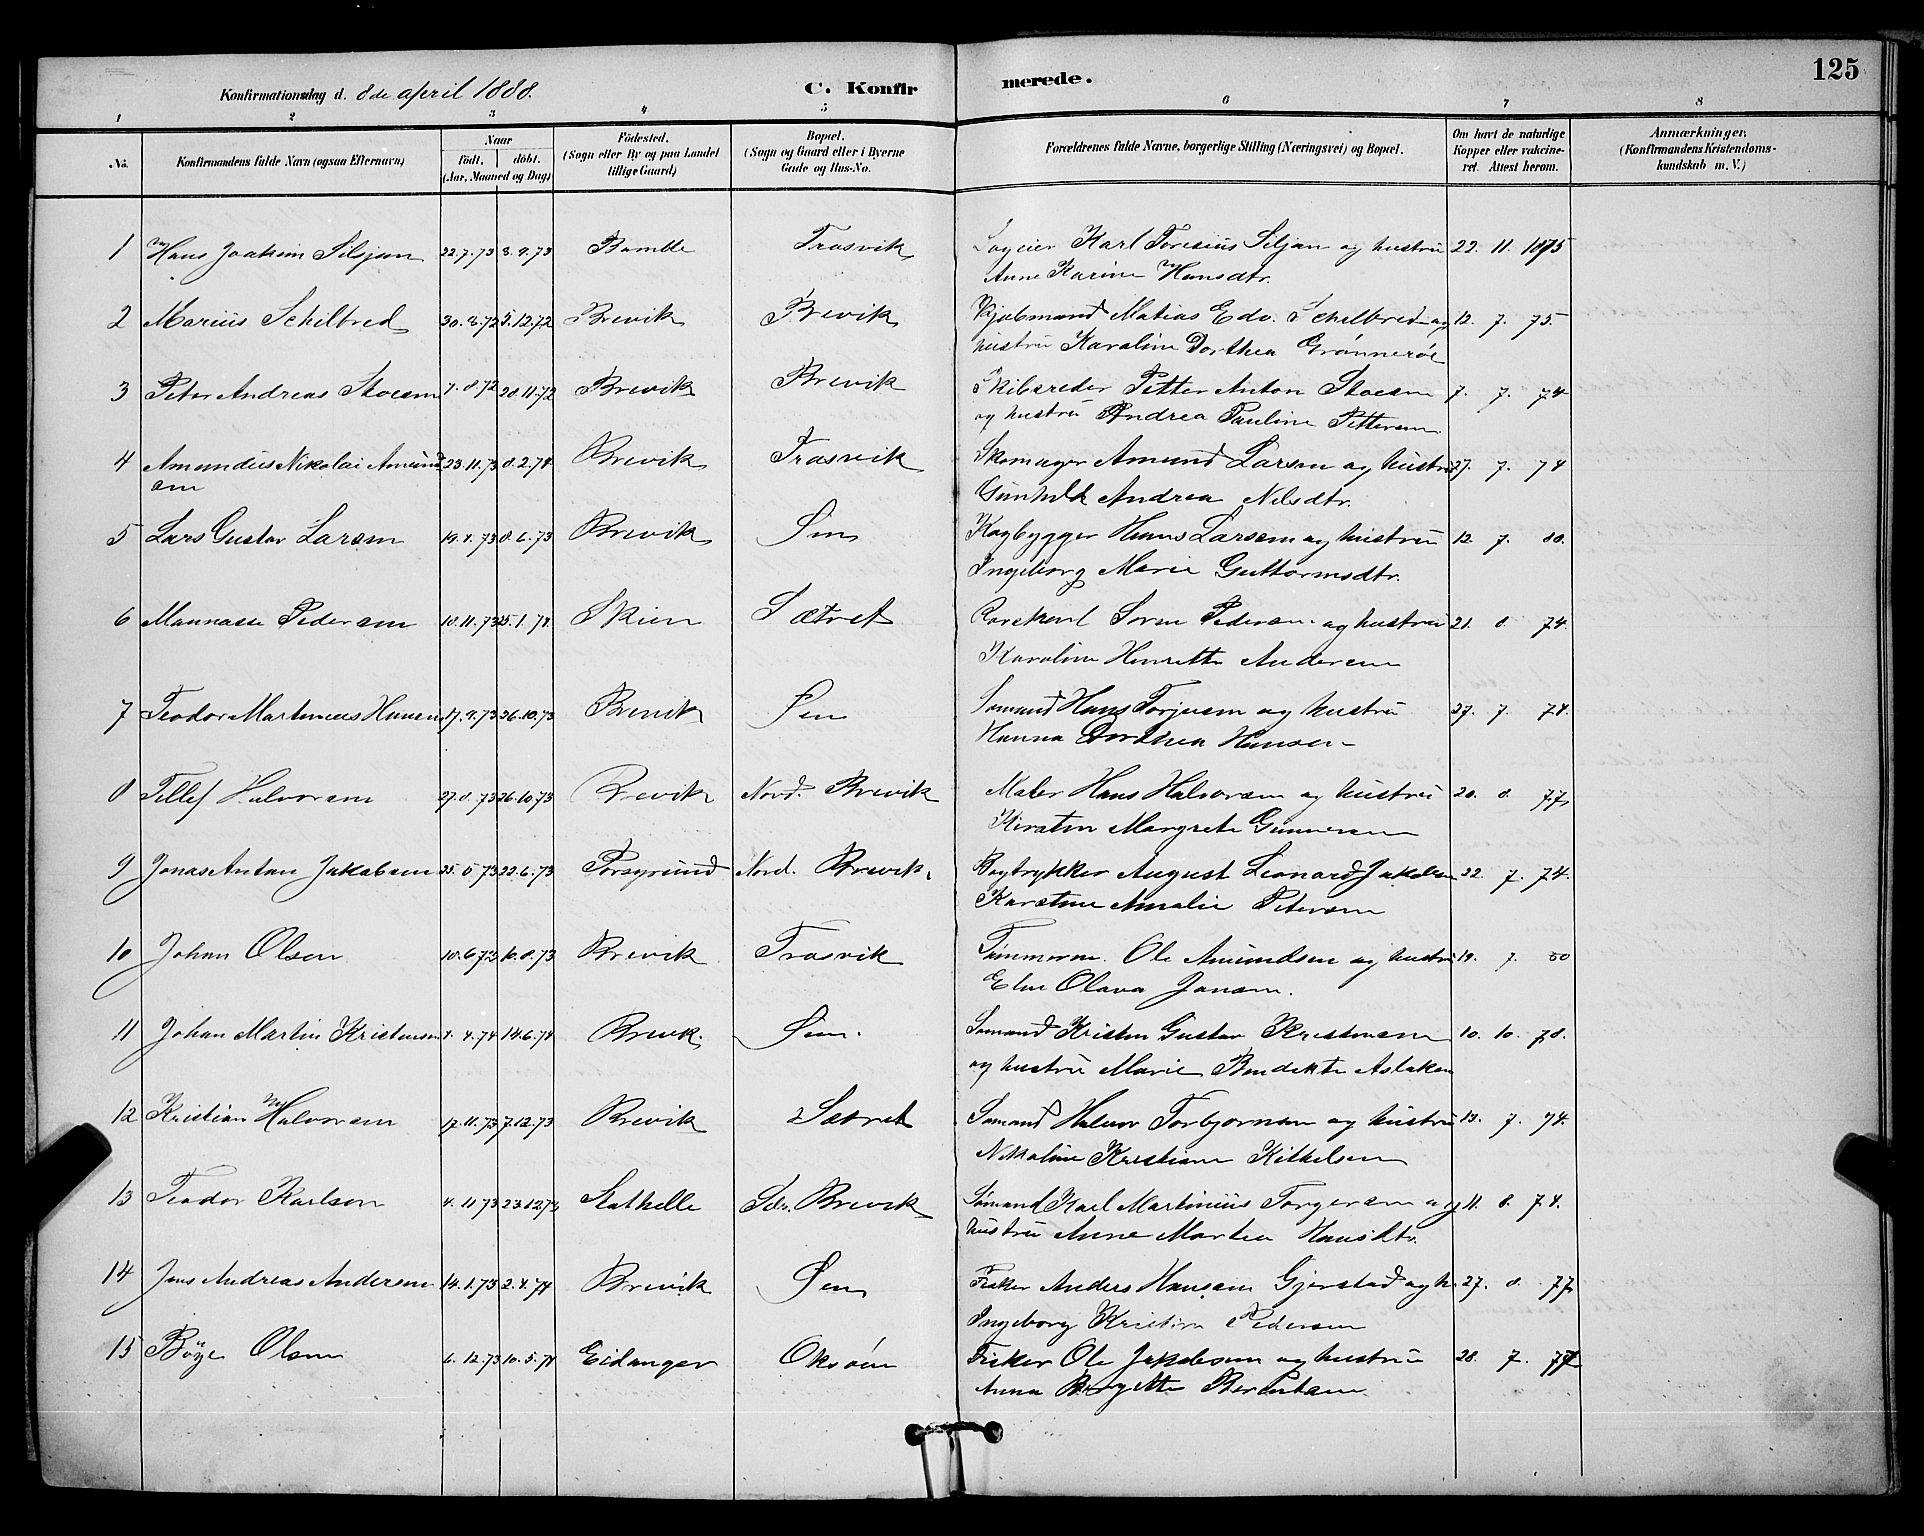 SAKO, Brevik kirkebøker, G/Ga/L0004: Klokkerbok nr. 4, 1882-1900, s. 125